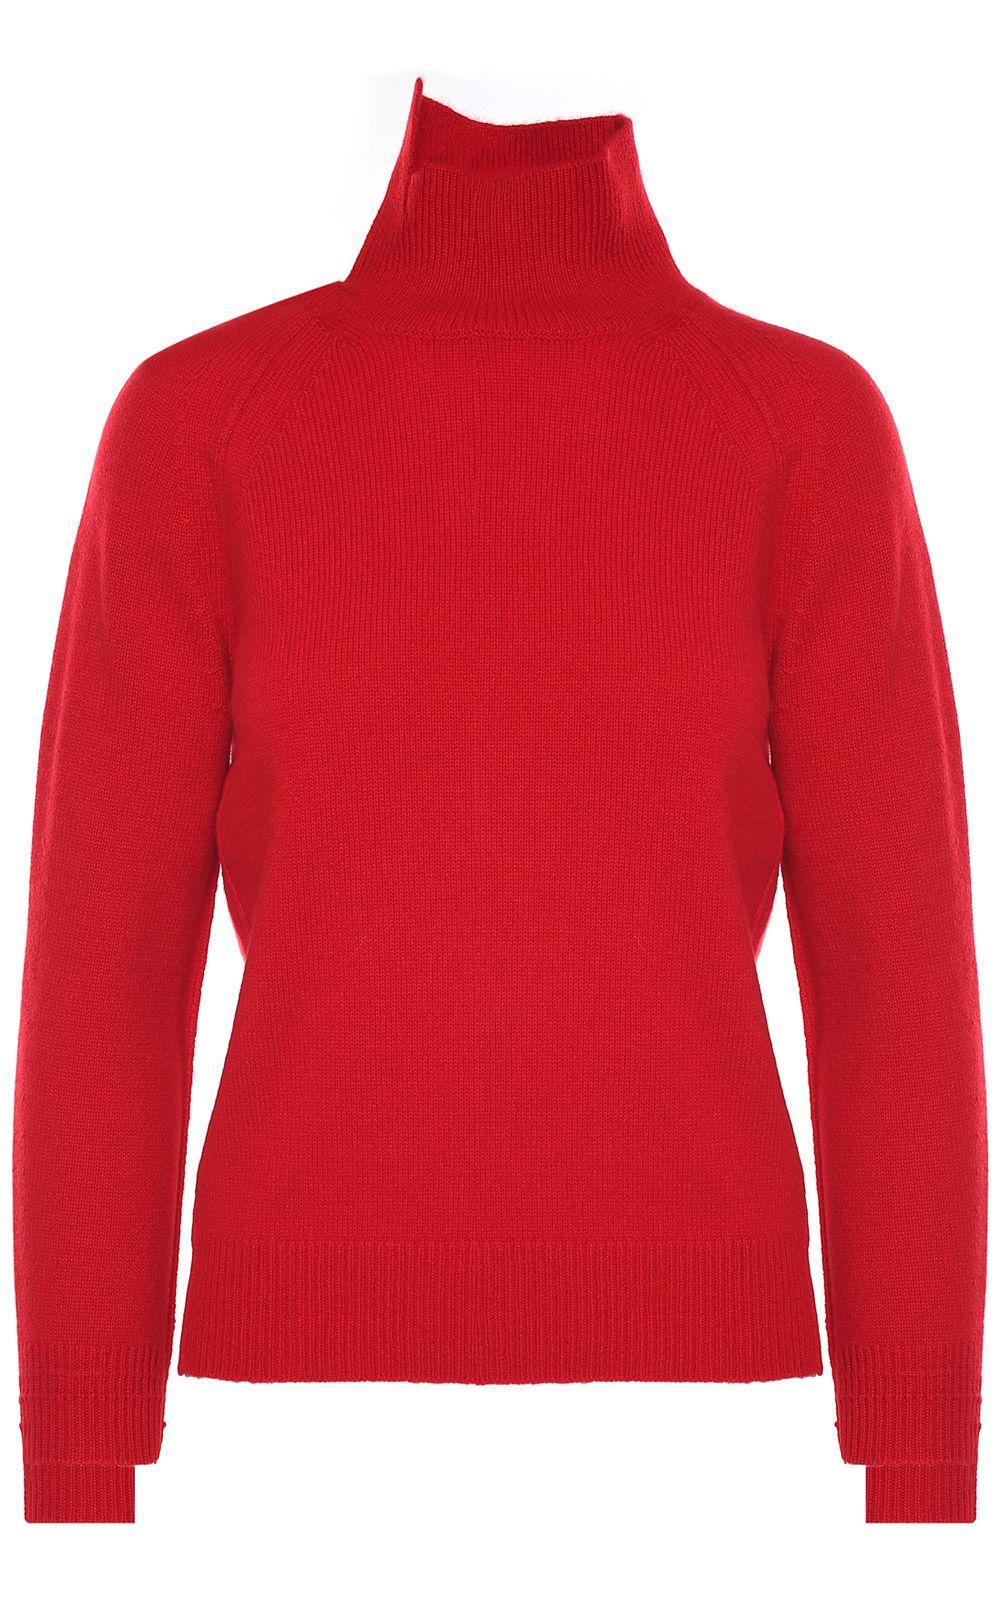 Helmut Lang Turtleneck Rib-knit Cashmere Sweater